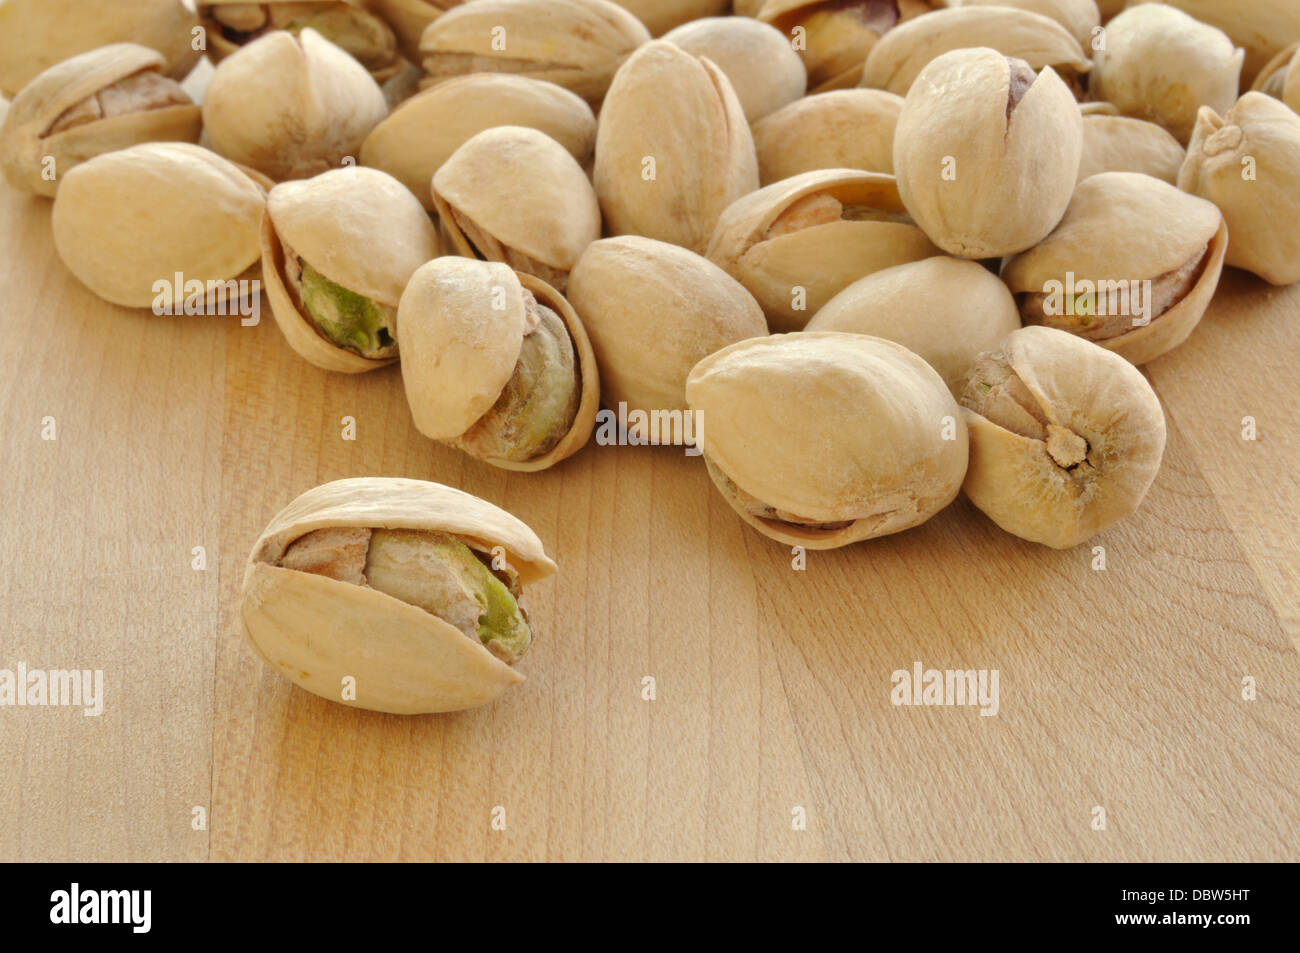 Pistachio nuts - Stock Image